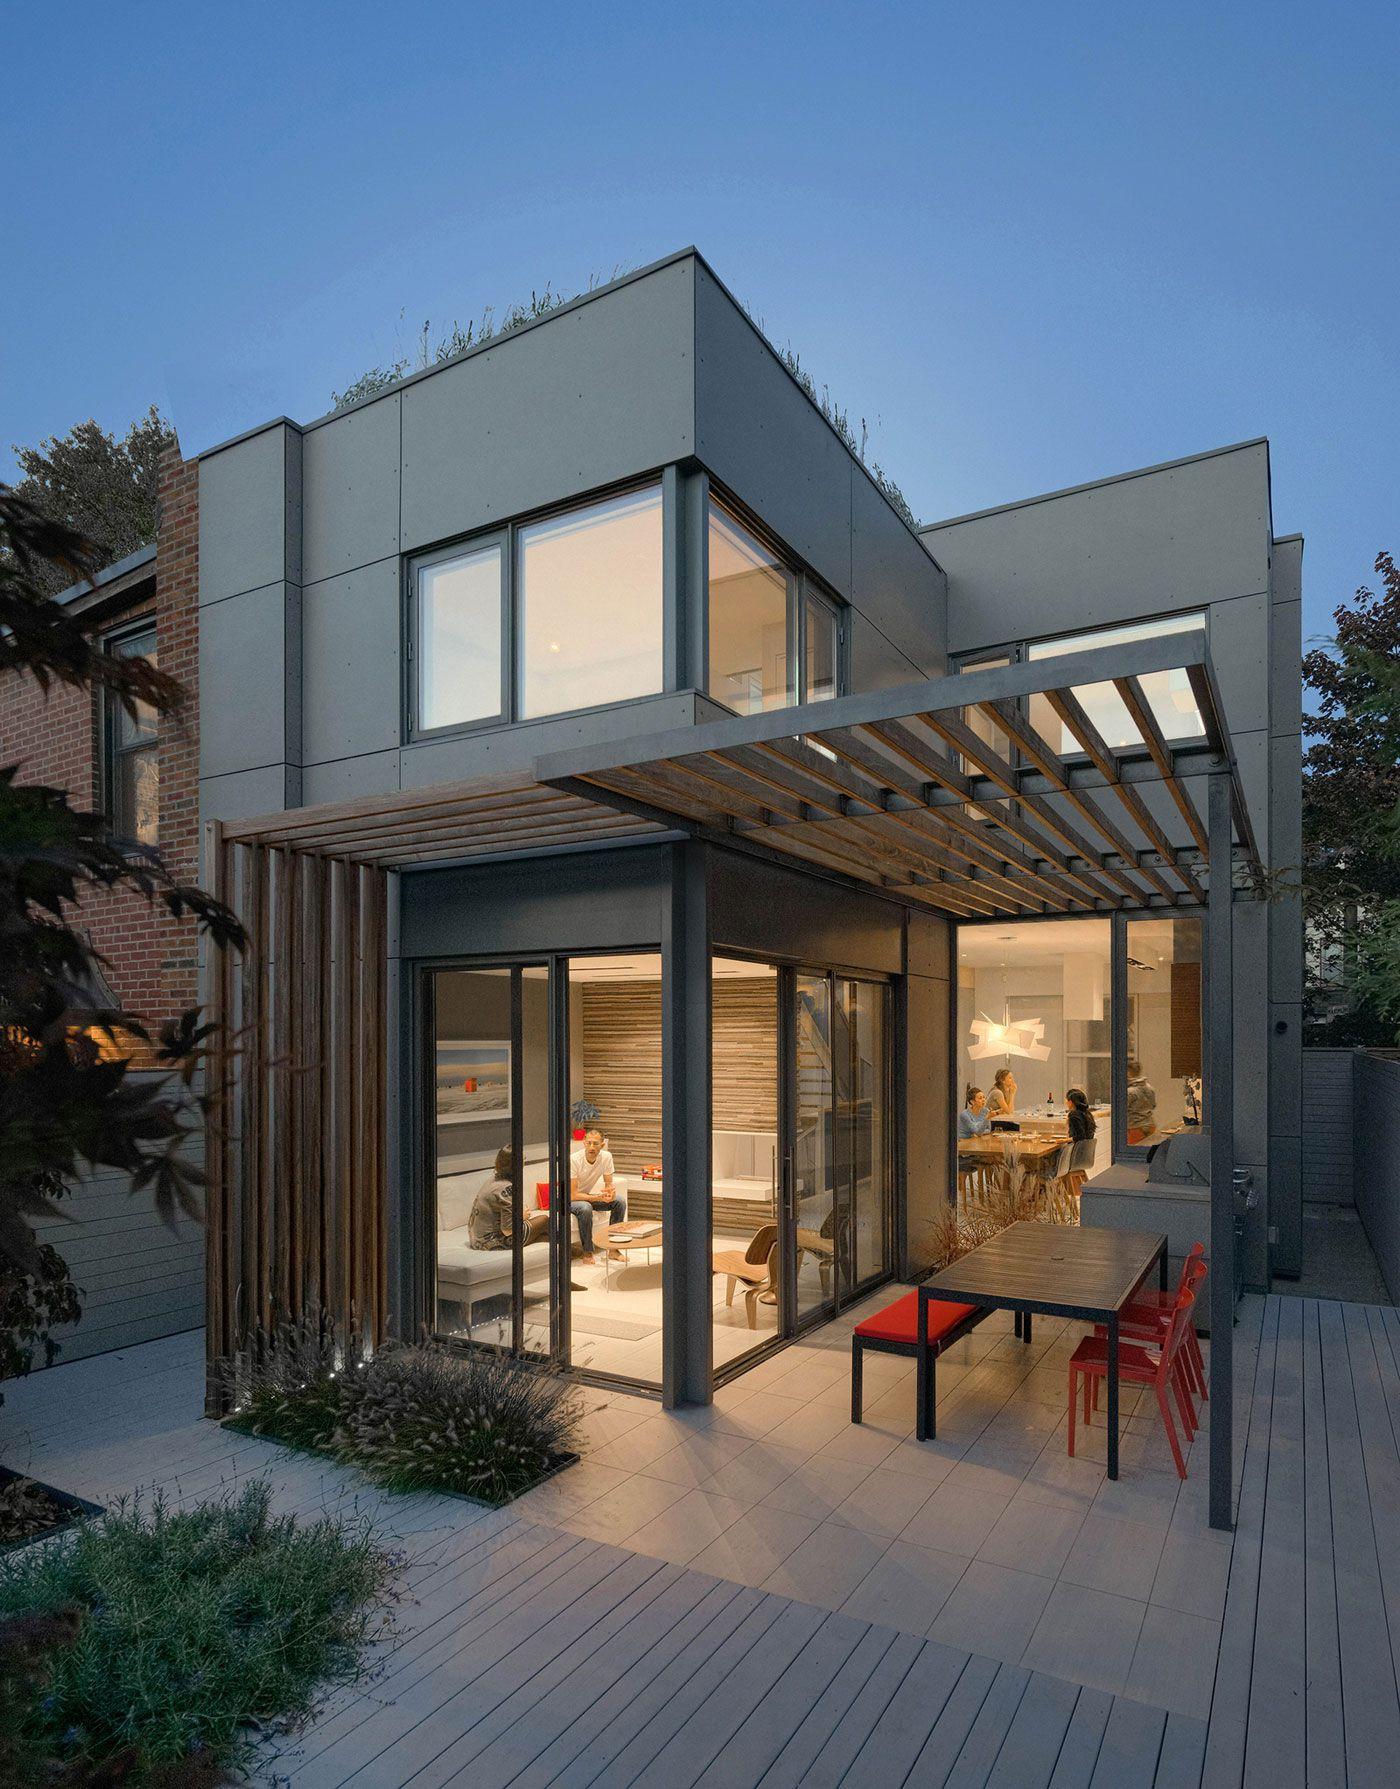 Planos de casa de dos pisos sencilla construye hogar for Imagenes de techos de casas modernas